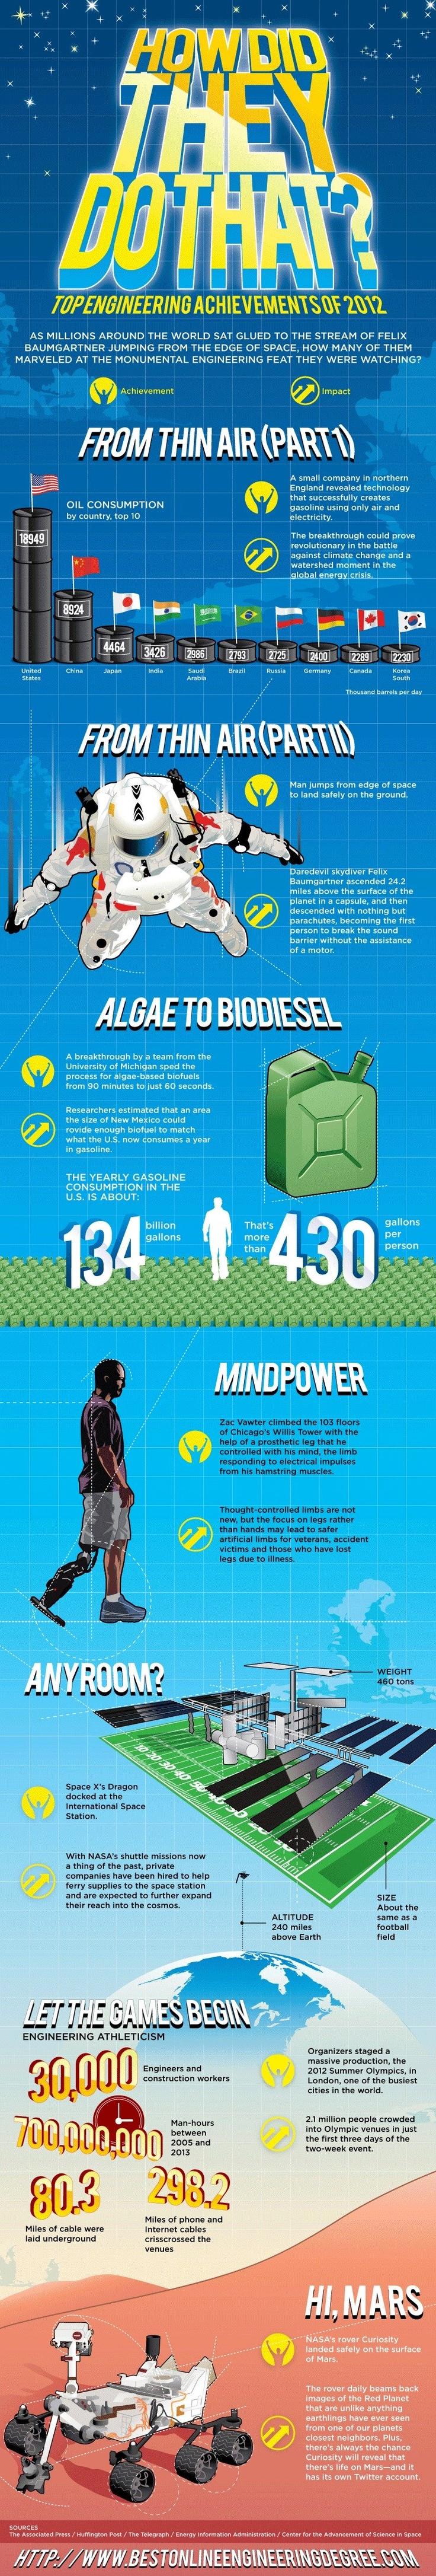 Nice info graphic.